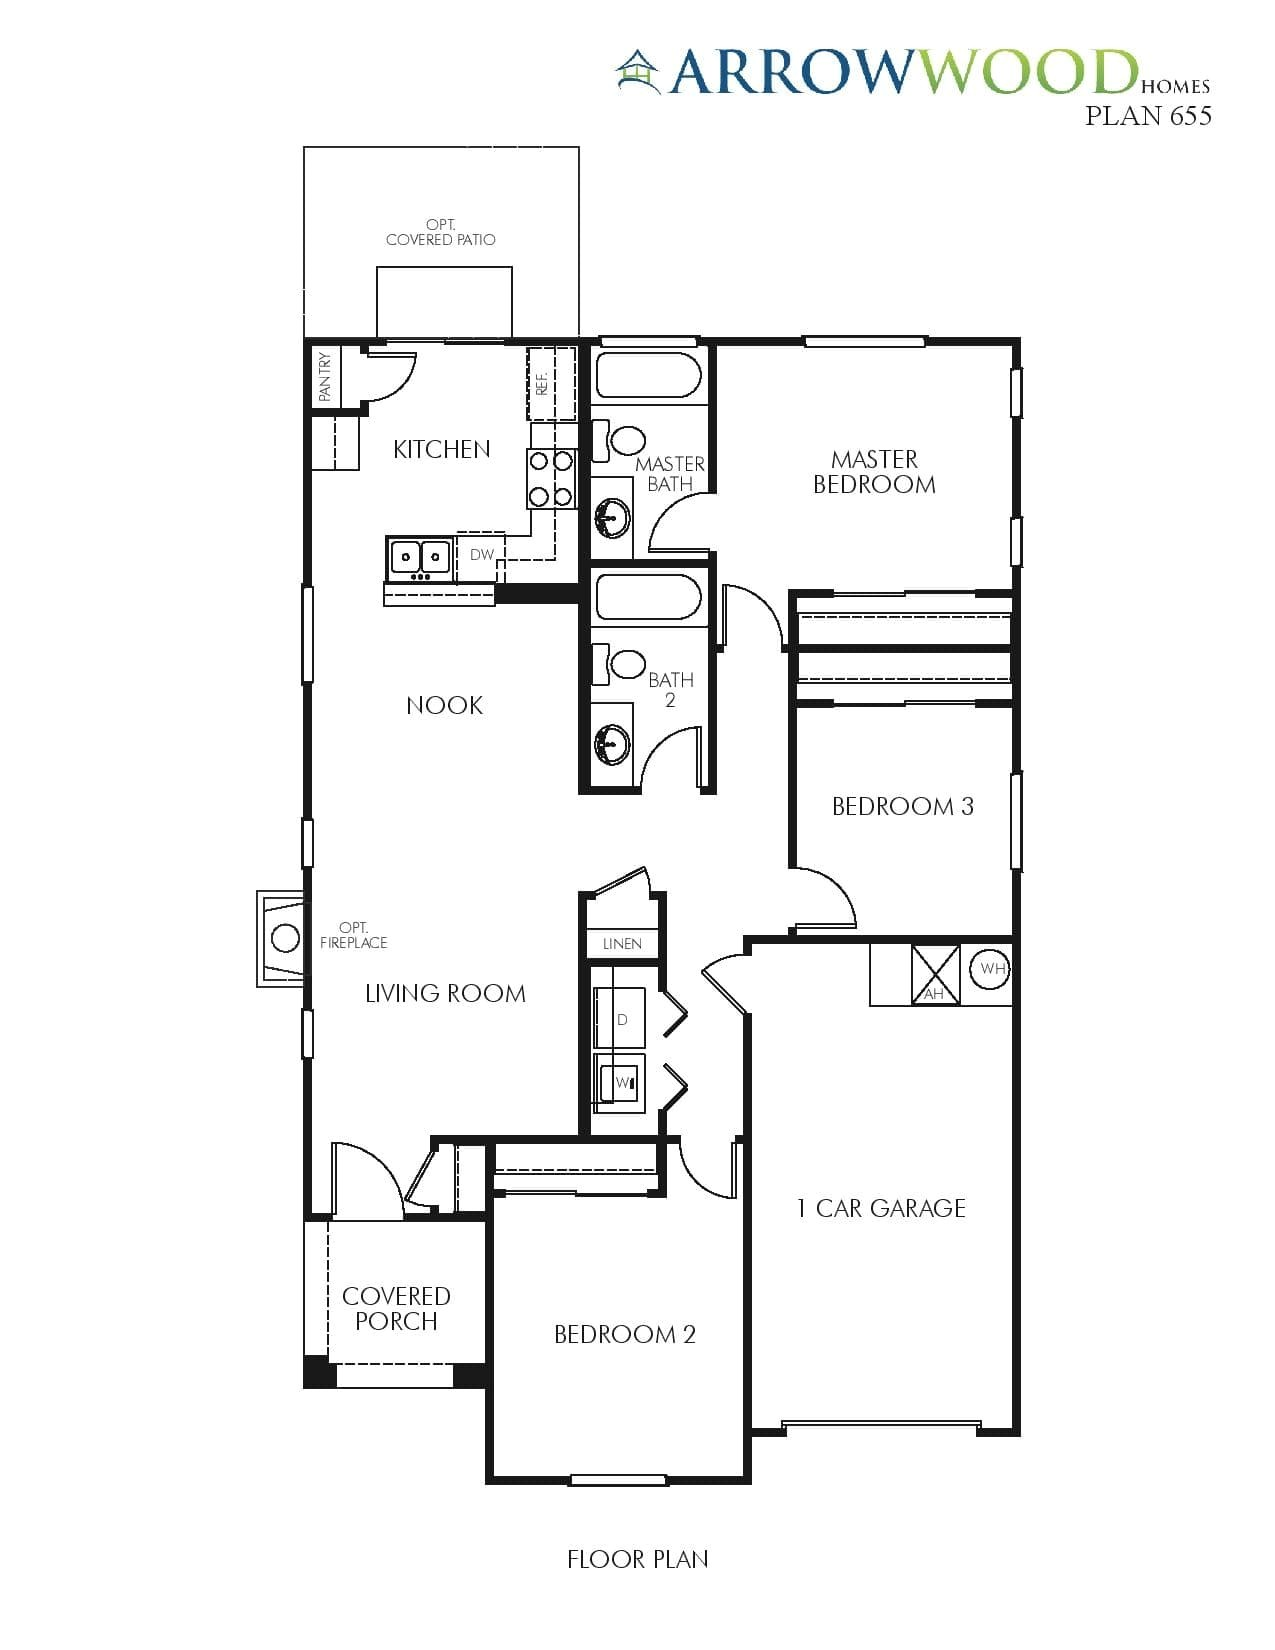 zia homes floor plans luxury arrowwood homes